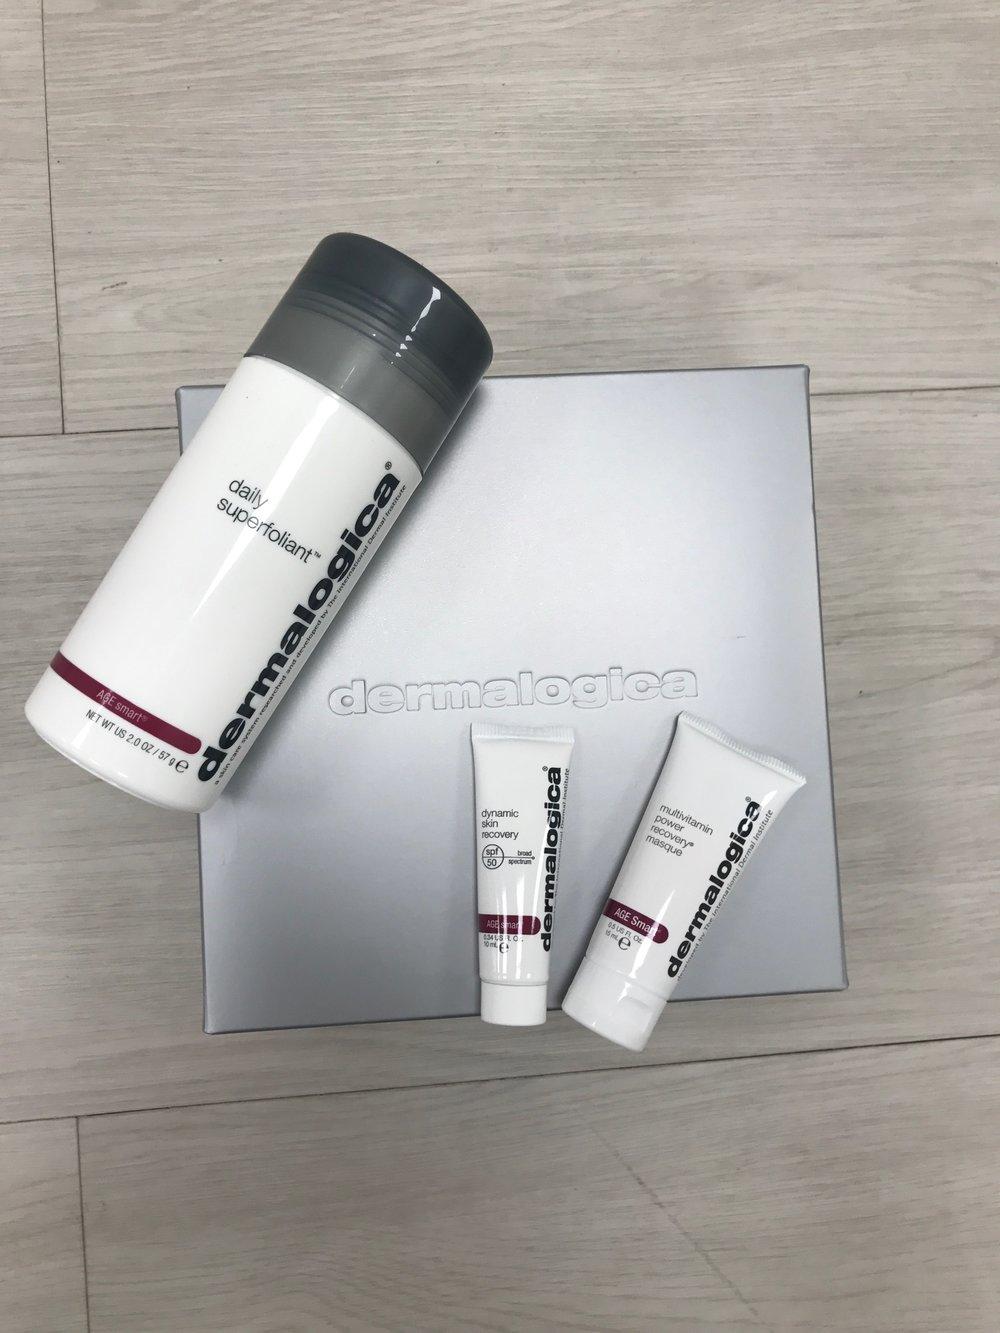 Dermalogica AGE Smart Anti-Aging Power Trio Gift Set ($58,  dermalogica.com )